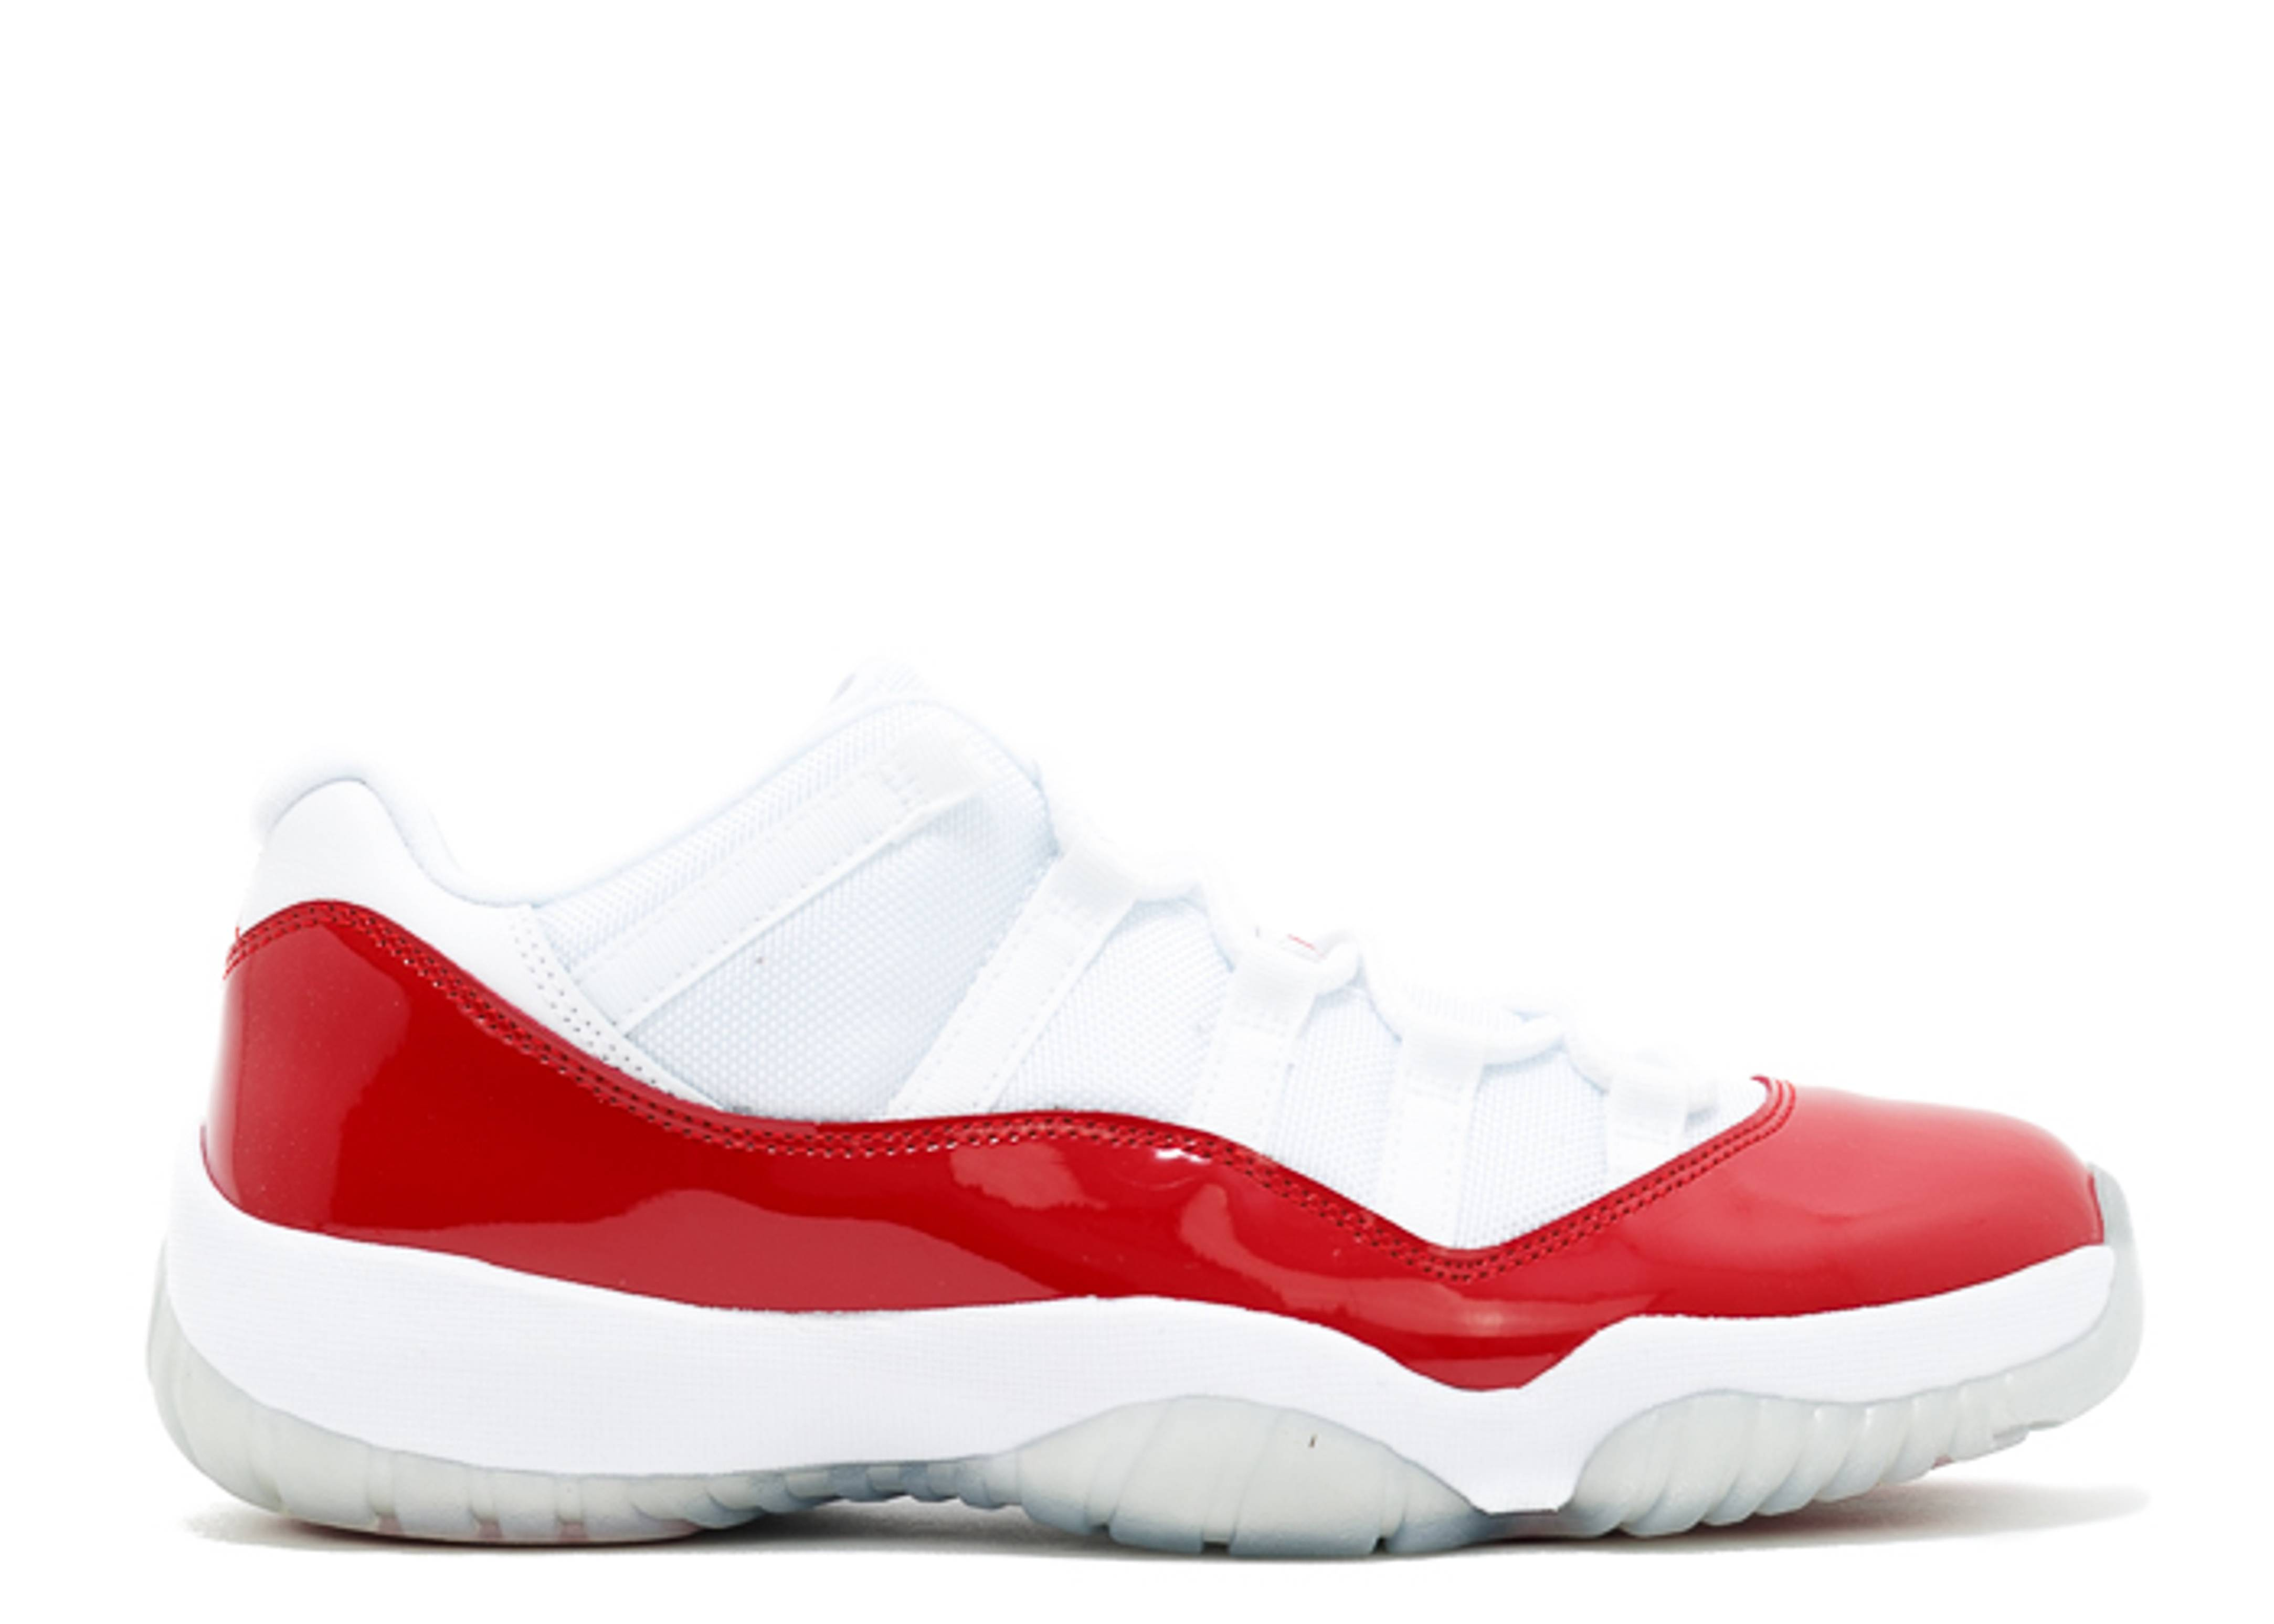 Air Jordan 11 Retro Low 'Cherry Bottom'